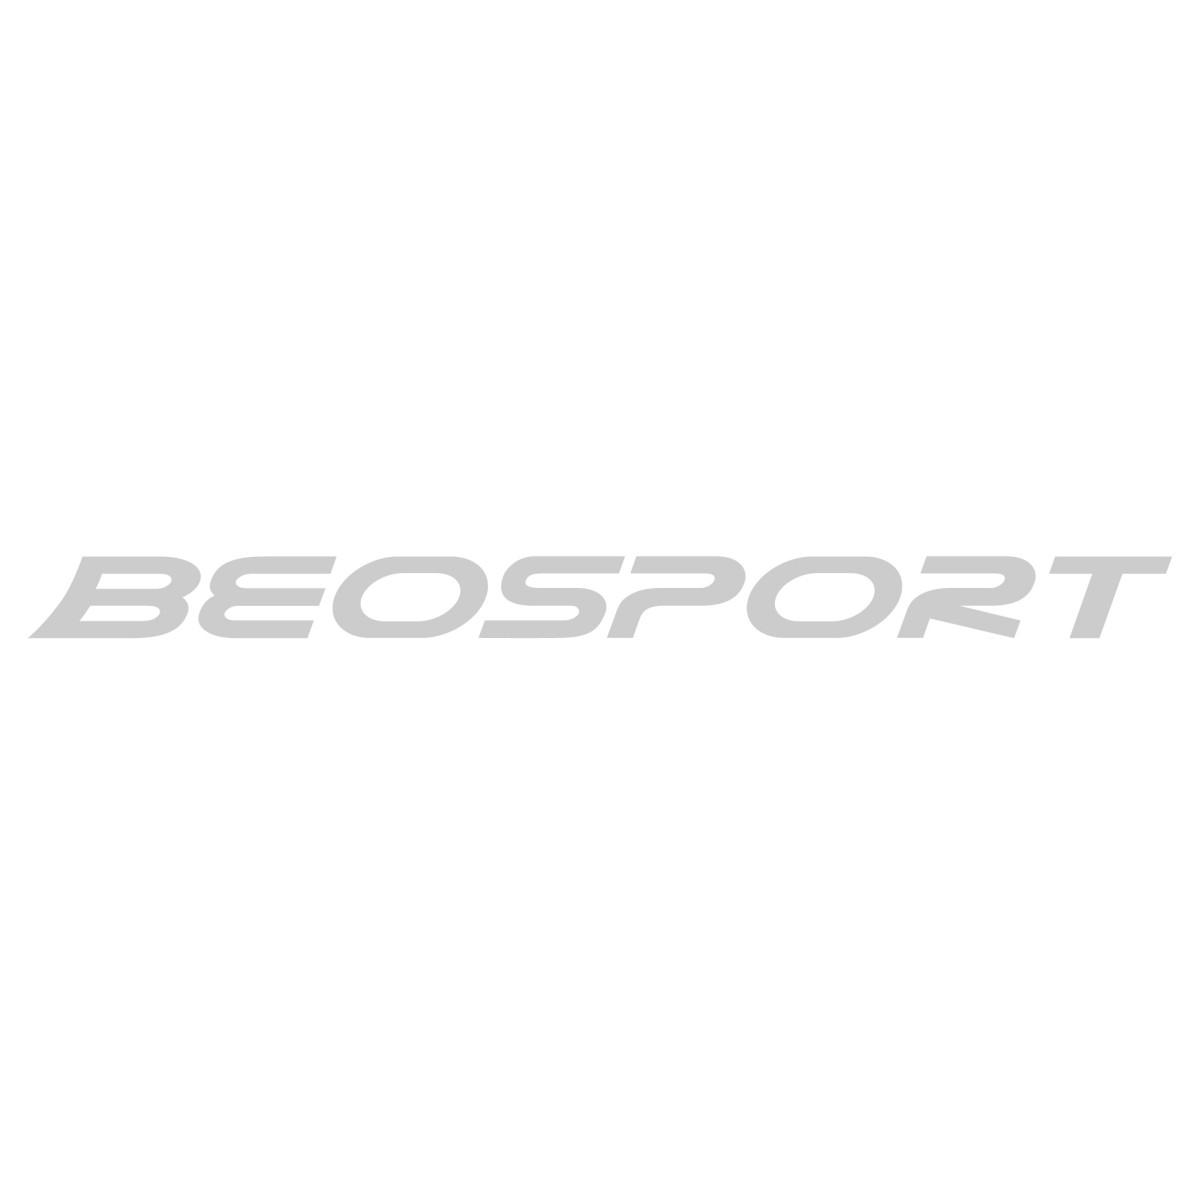 Wilson Pro Tour lopta za odbojku